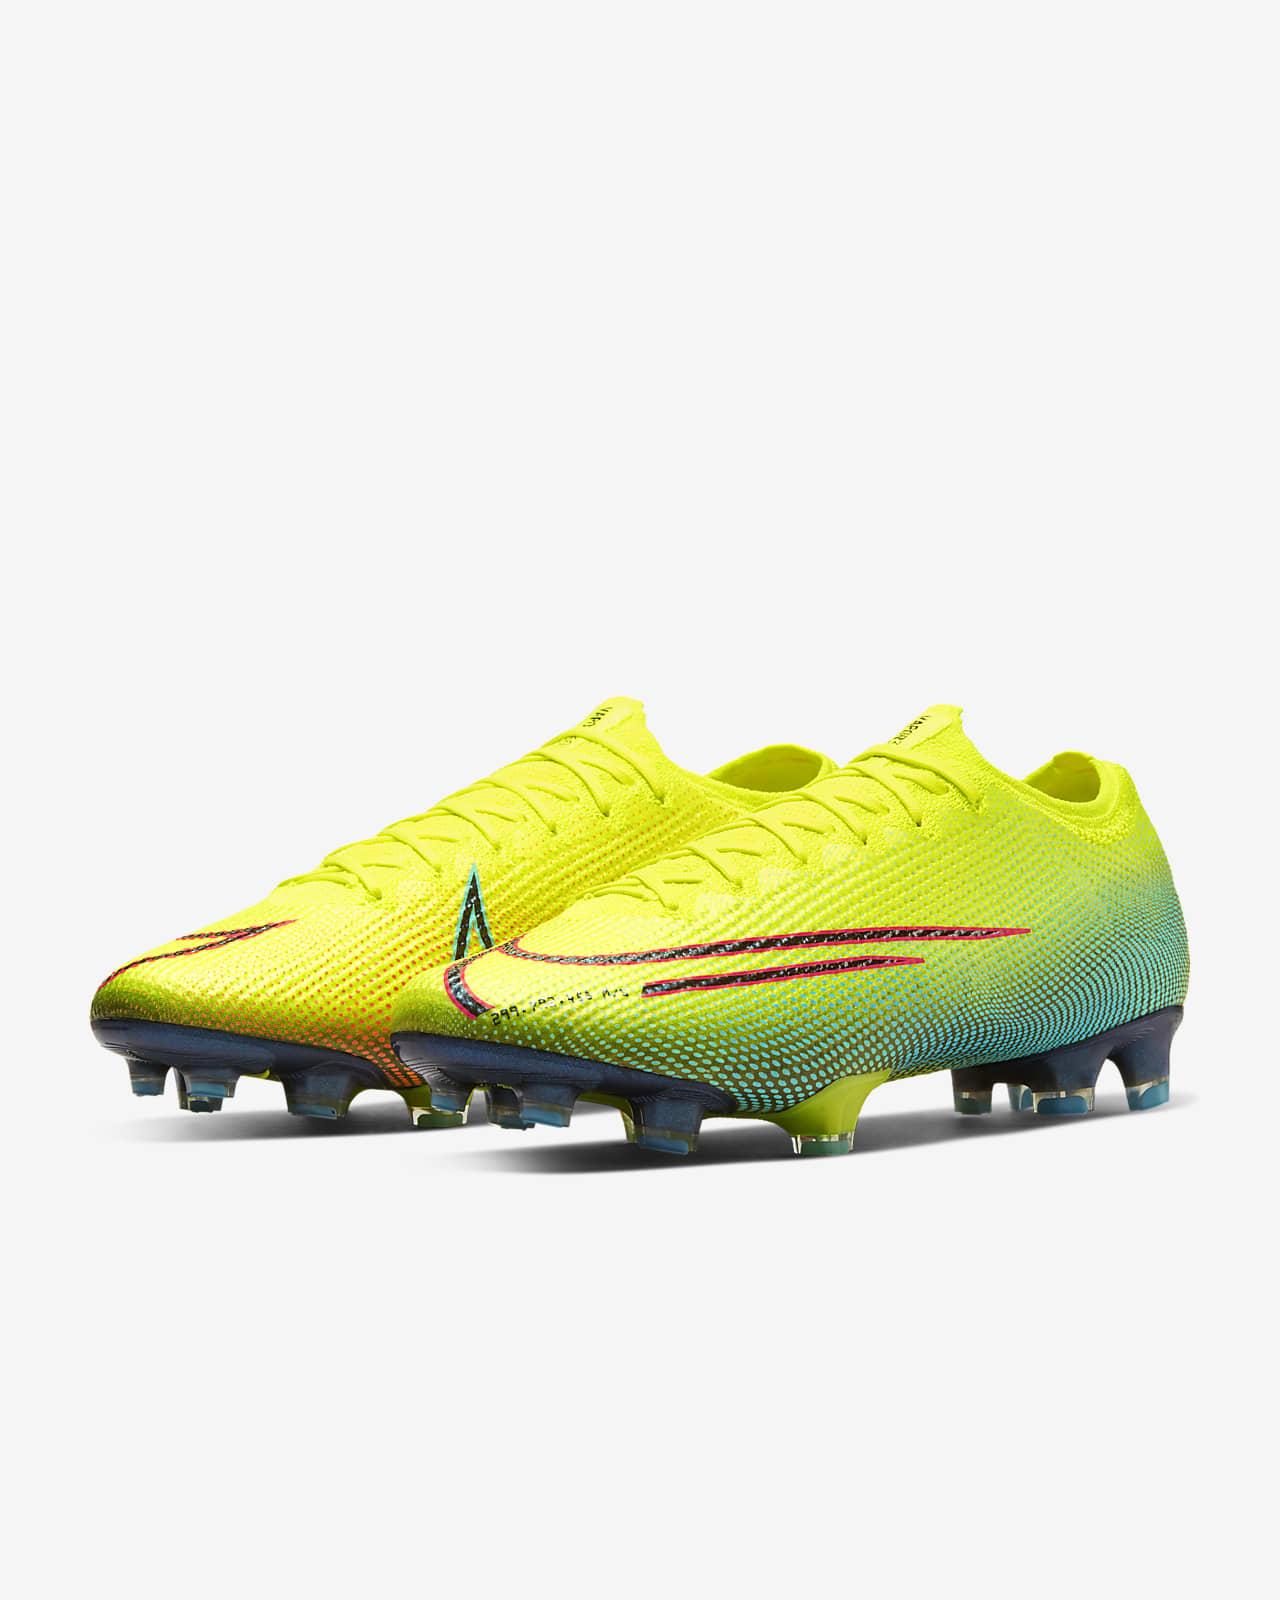 Nike Mercurial Vapor 13 Elite MDS FG